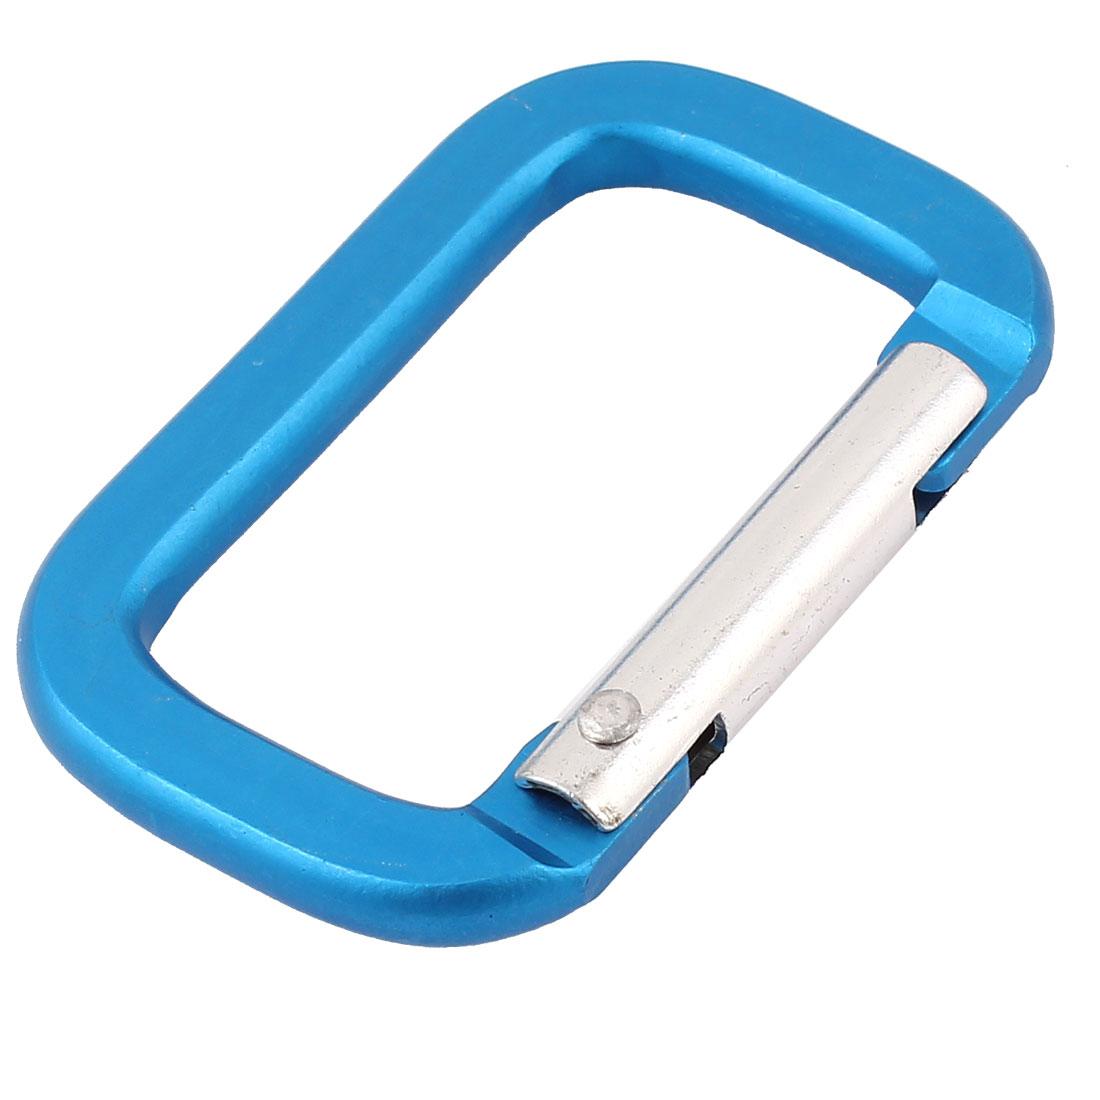 Camping Hiking Sport Karabiner Carabiner Clip Snap Hook Keychain Keyring Blue